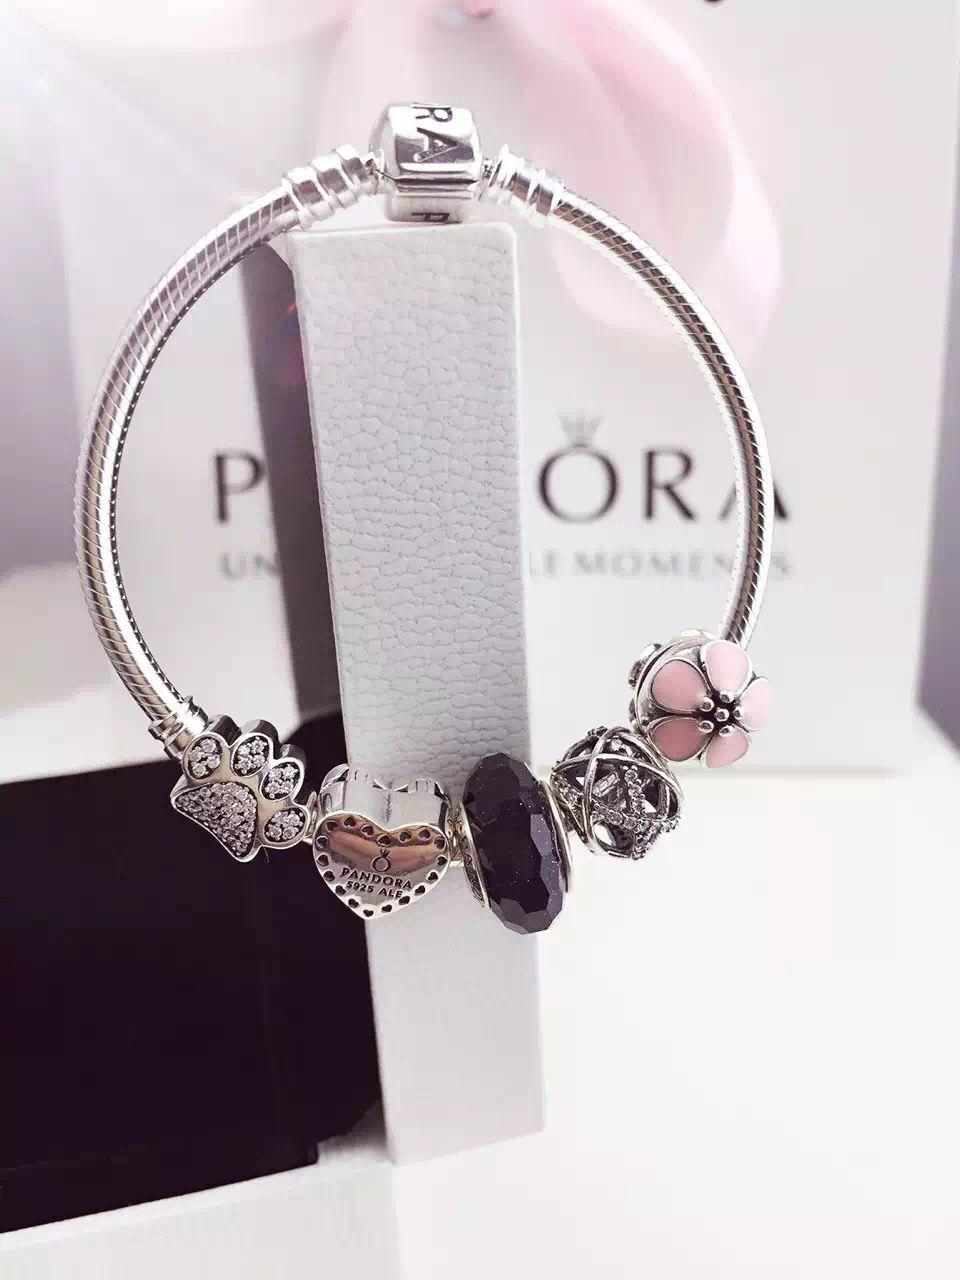 fbd423a3d $159 Pandora Charm Bracelet Black Pink. Hot Sale!!! SKU: CB01726 - PANDORA  Bracelet Ideas